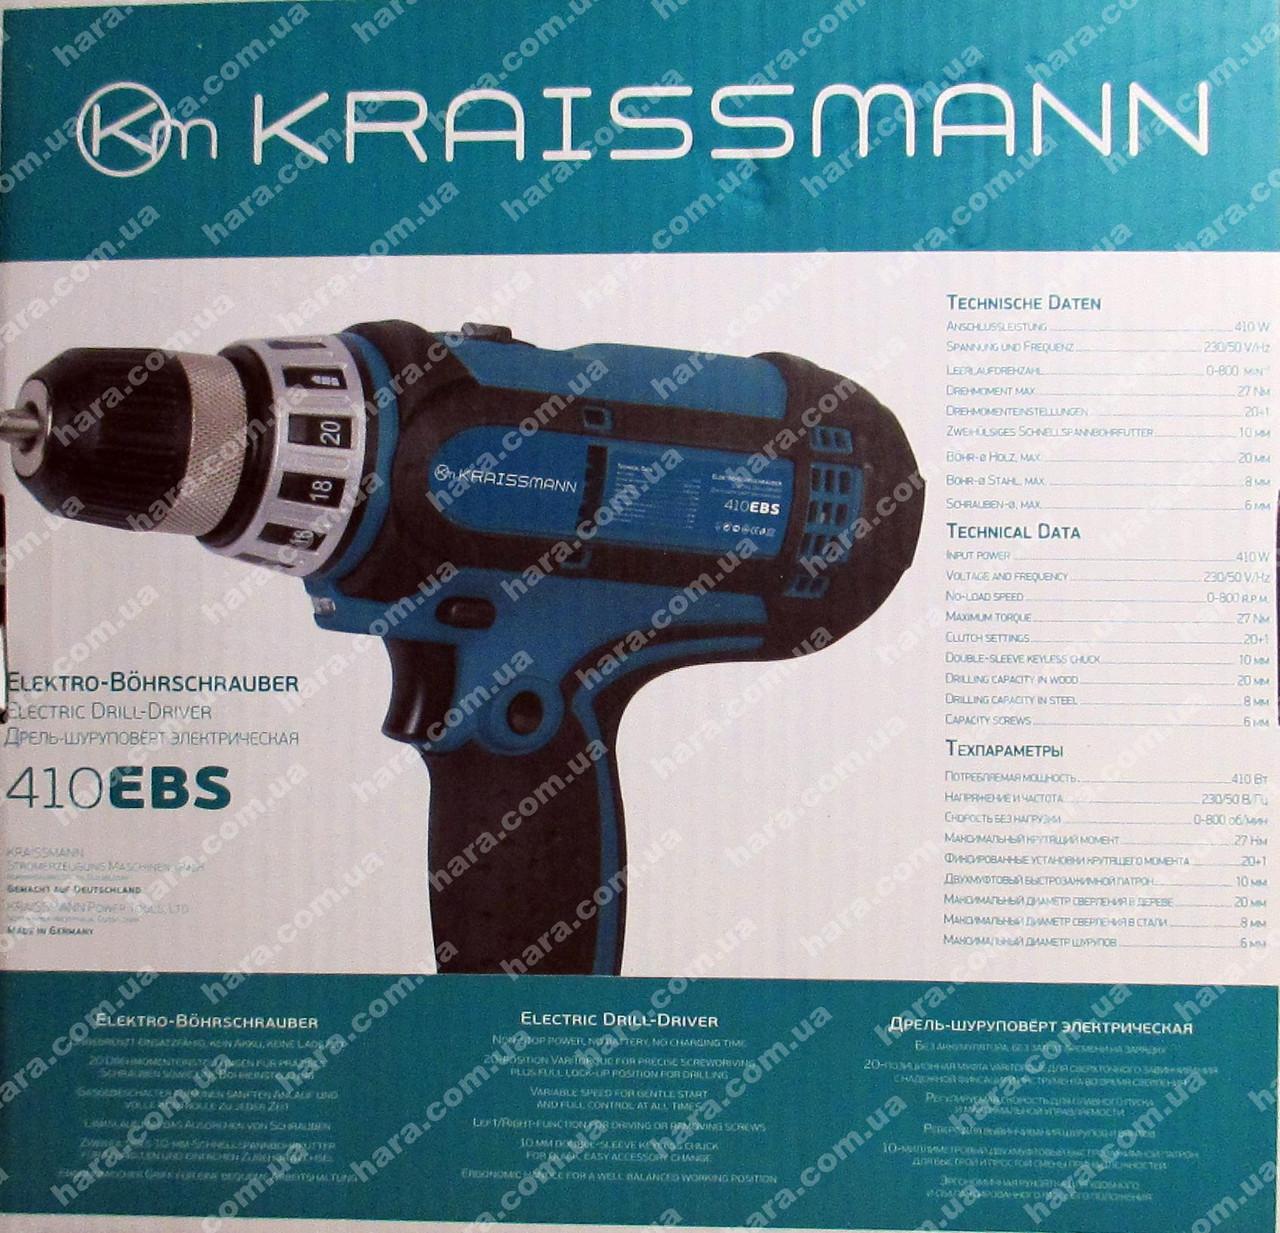 Сетевой шуруповерт Kraissmann (2-х скоростной)